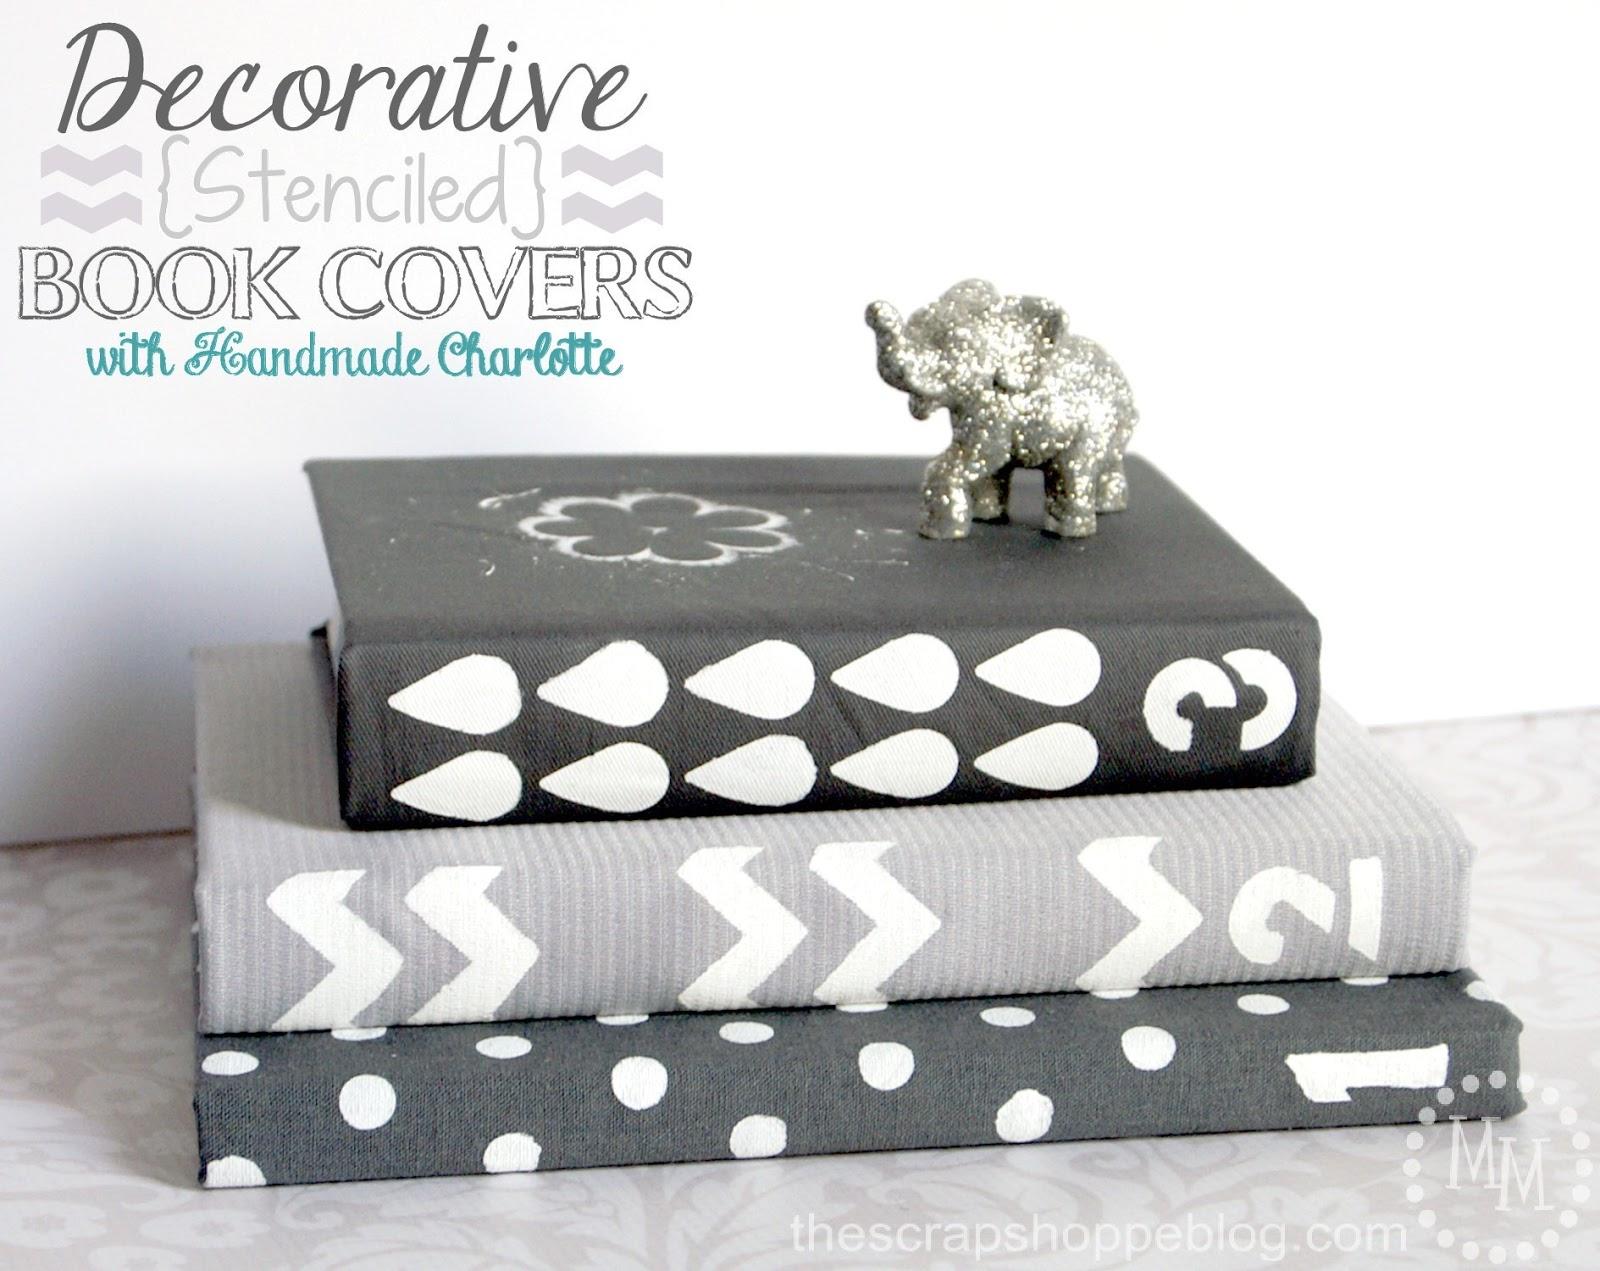 How To Make A Decorative Book Cover : Decorative stenciled book covers the scrap shoppe